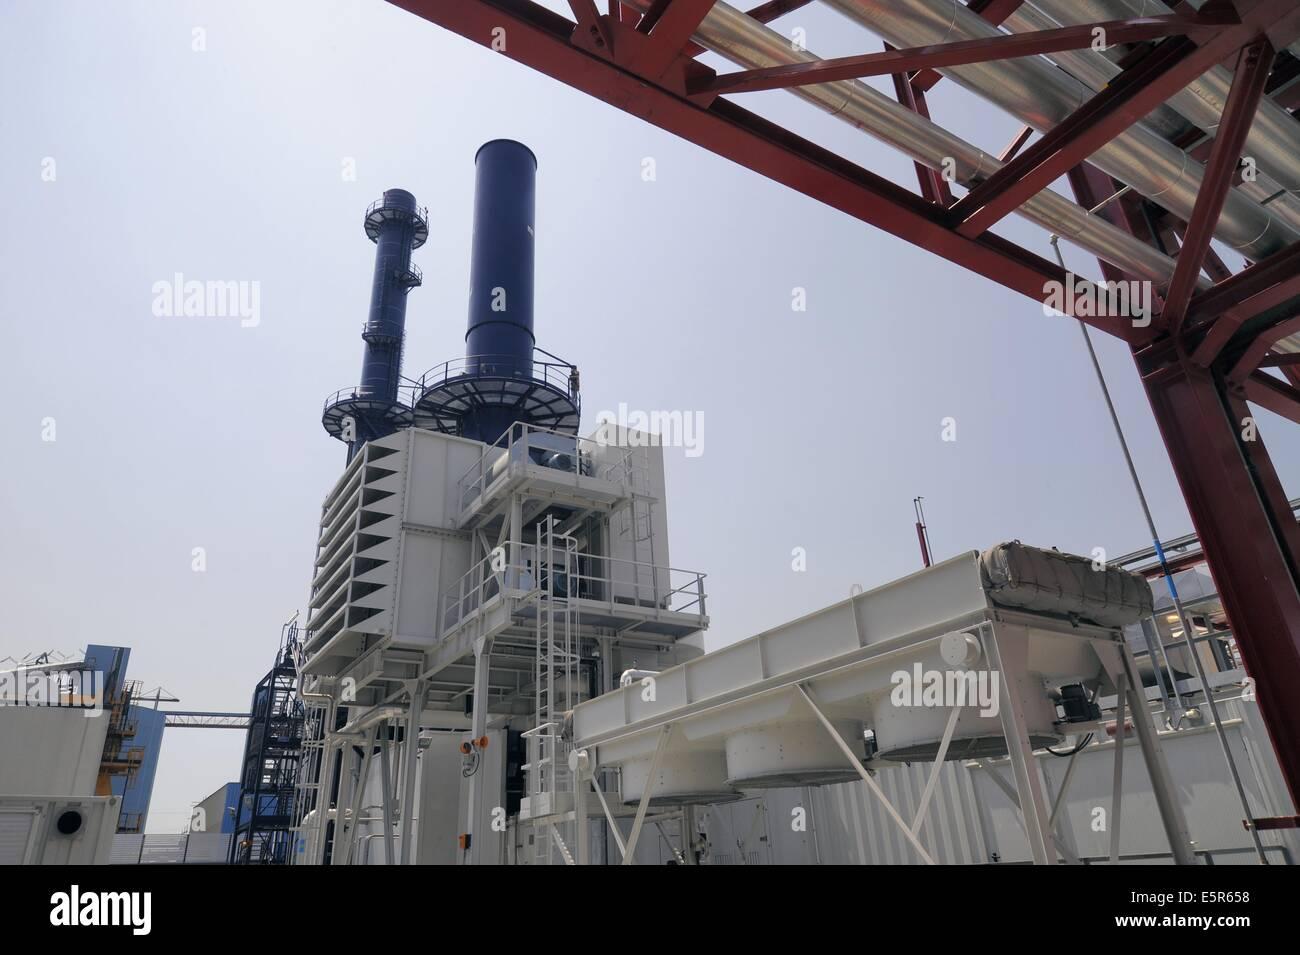 ENEL thermoelectric power plant Palladio in Fusina (Venice, Italy) Stock Photo